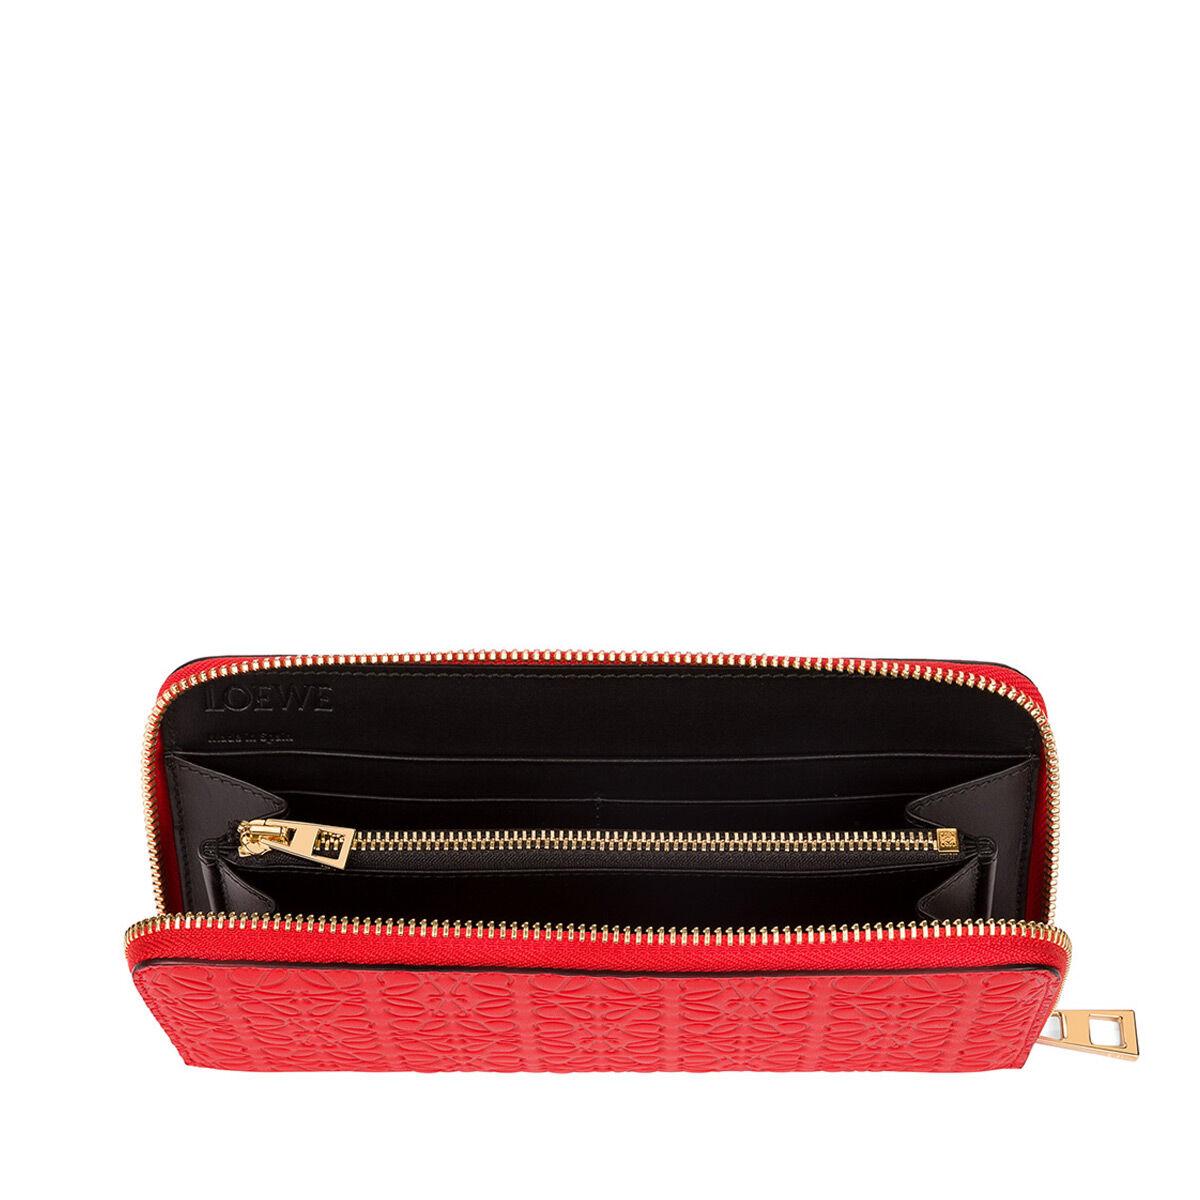 LOEWE Zip Around Wallet Primary Red all